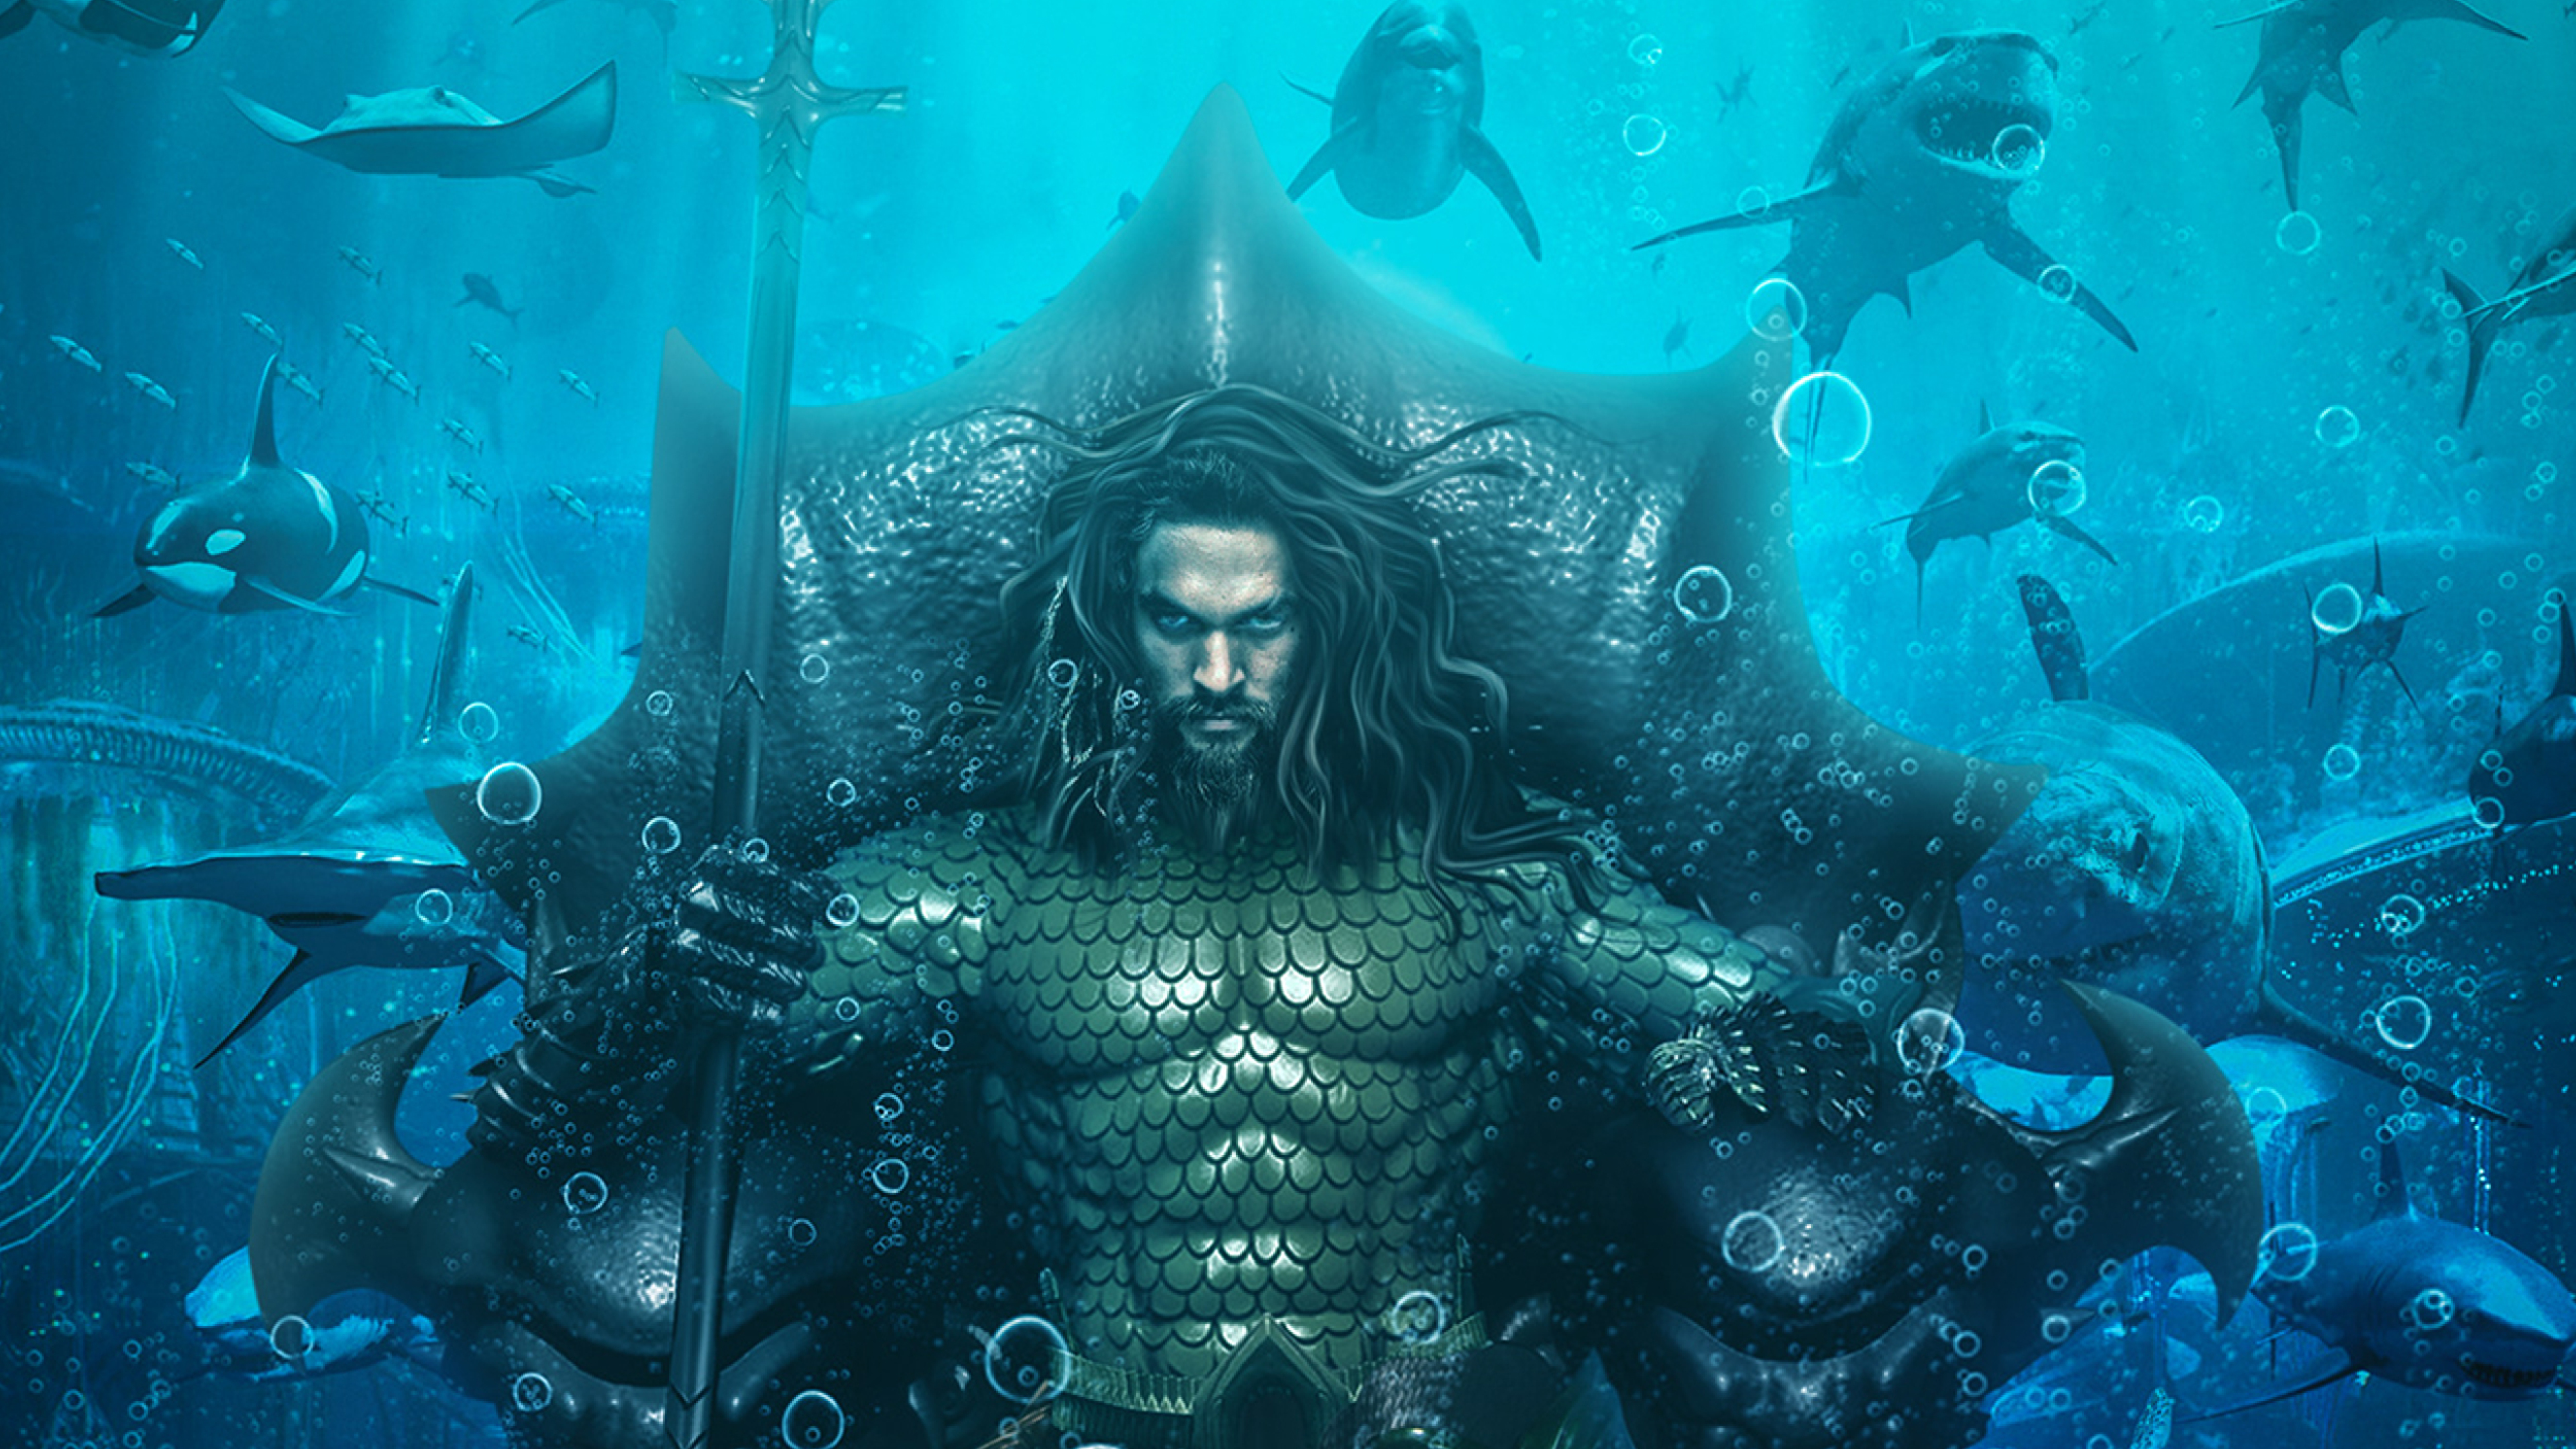 3840x2160 Aquaman King Of Atlantis 4k Wallpaper Hd Movies